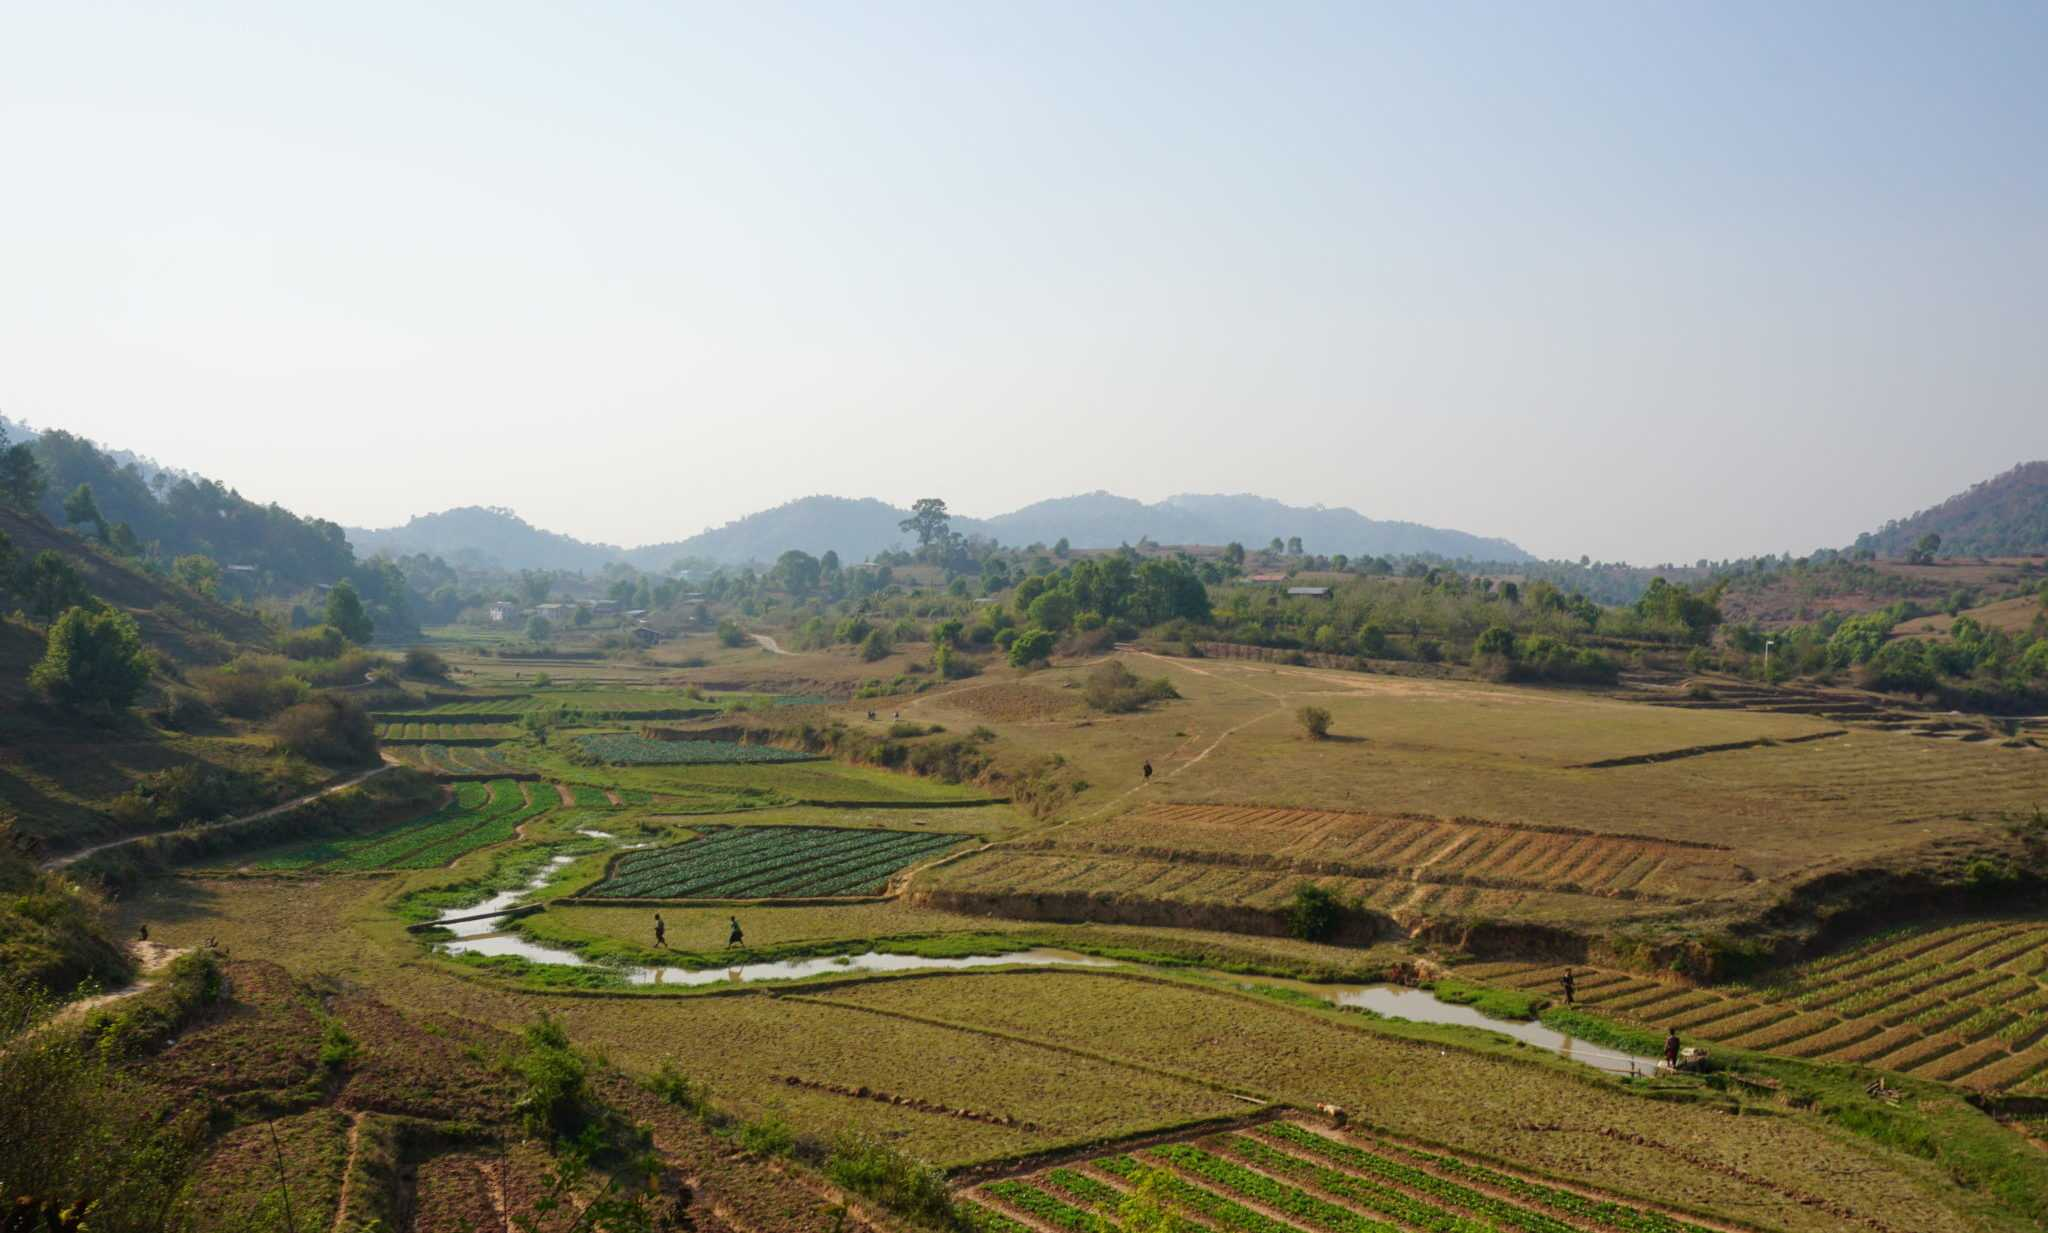 Day 2 Kyaing Tong & Surrounding Villages               (B/L/D)